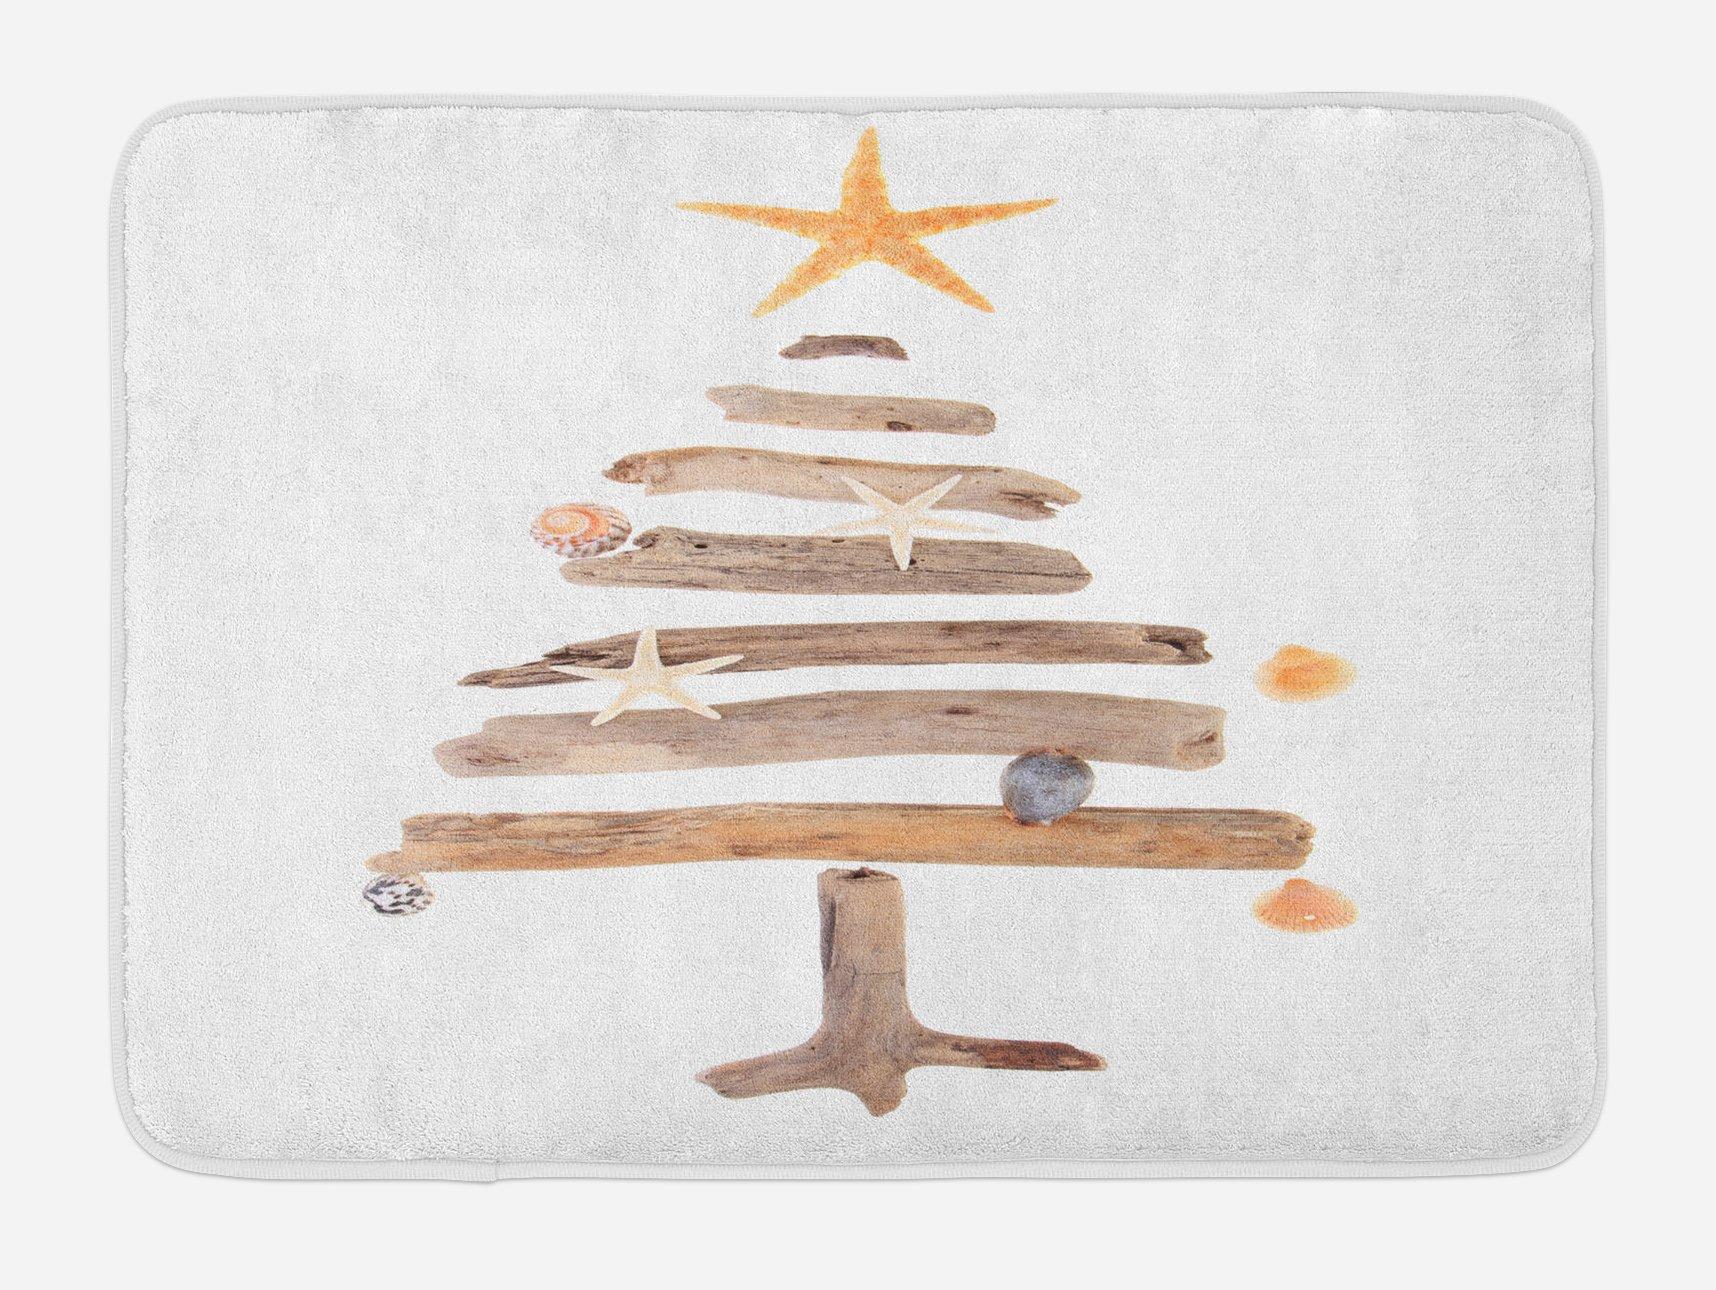 Lunarable Christmas Bath Mat, Driftwood Tree with Ornamental Nautical Design Starfish and Seashells Noel Theme, Plush Bathroom Decor Mat with Non Slip Backing, 29.5 W X 17.5 W Inches, Multicolor